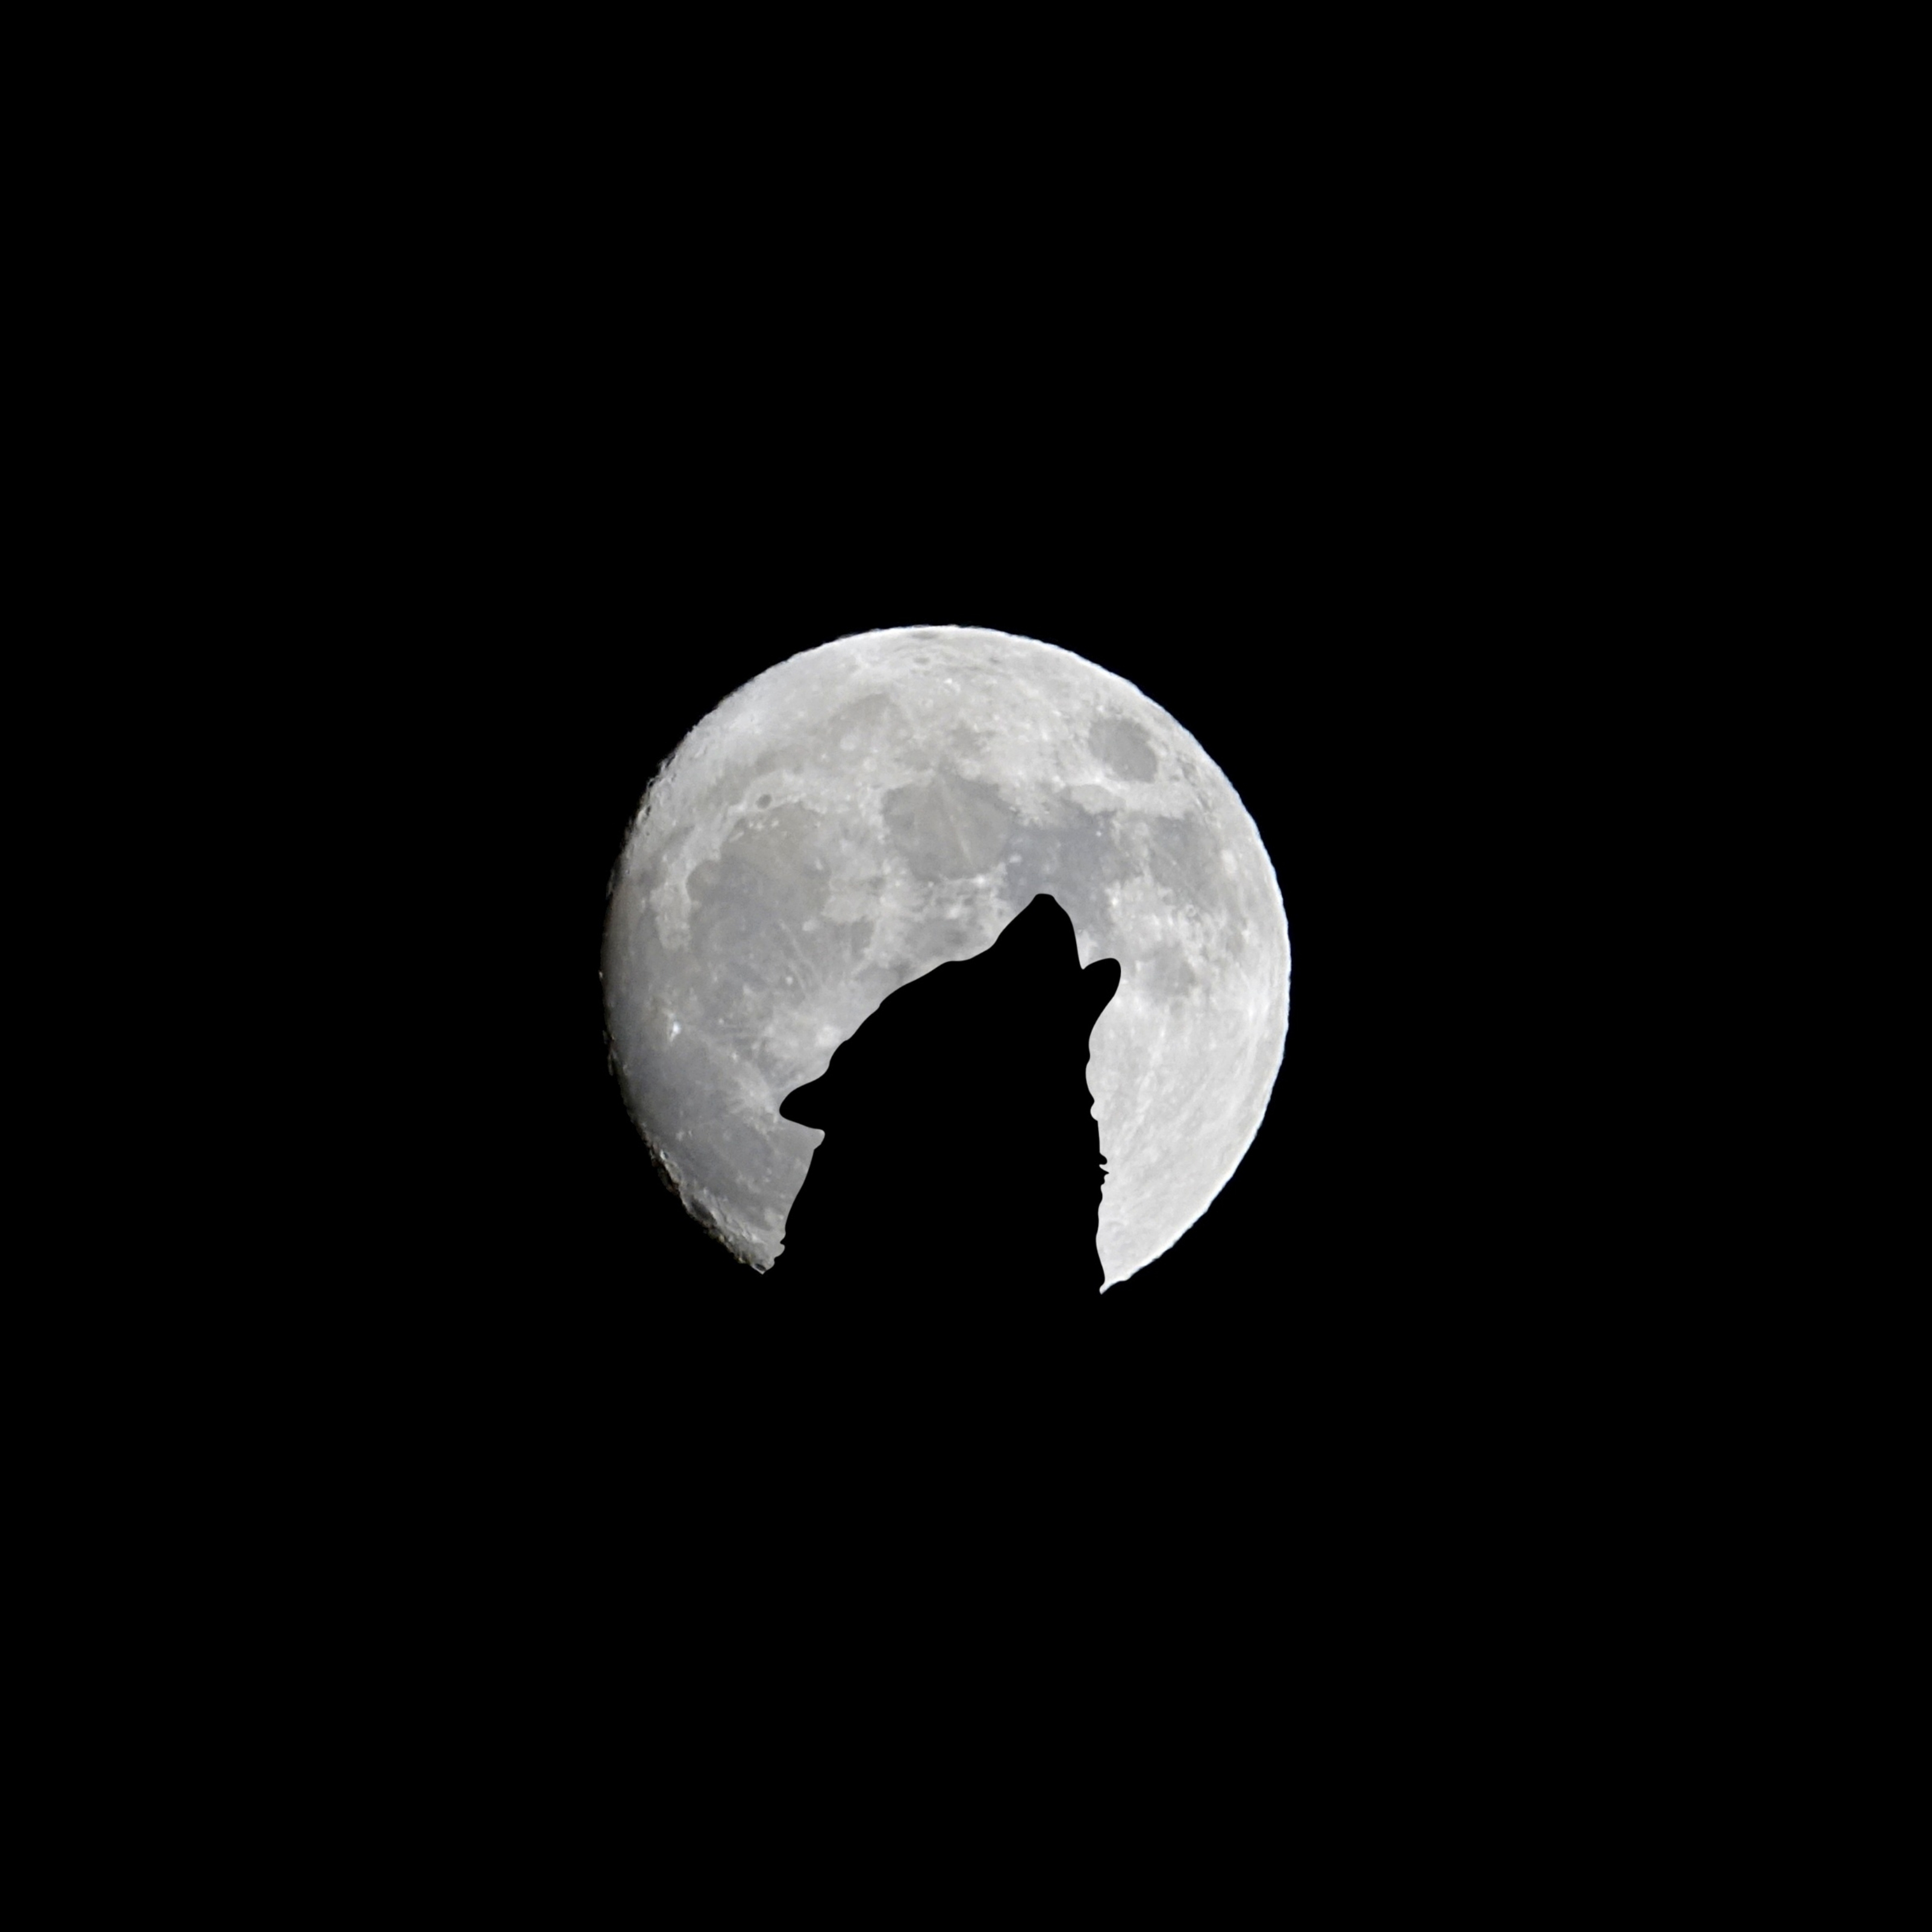 Silhouette of Wolf Full Moon Night Darkness iPad Wallpaper